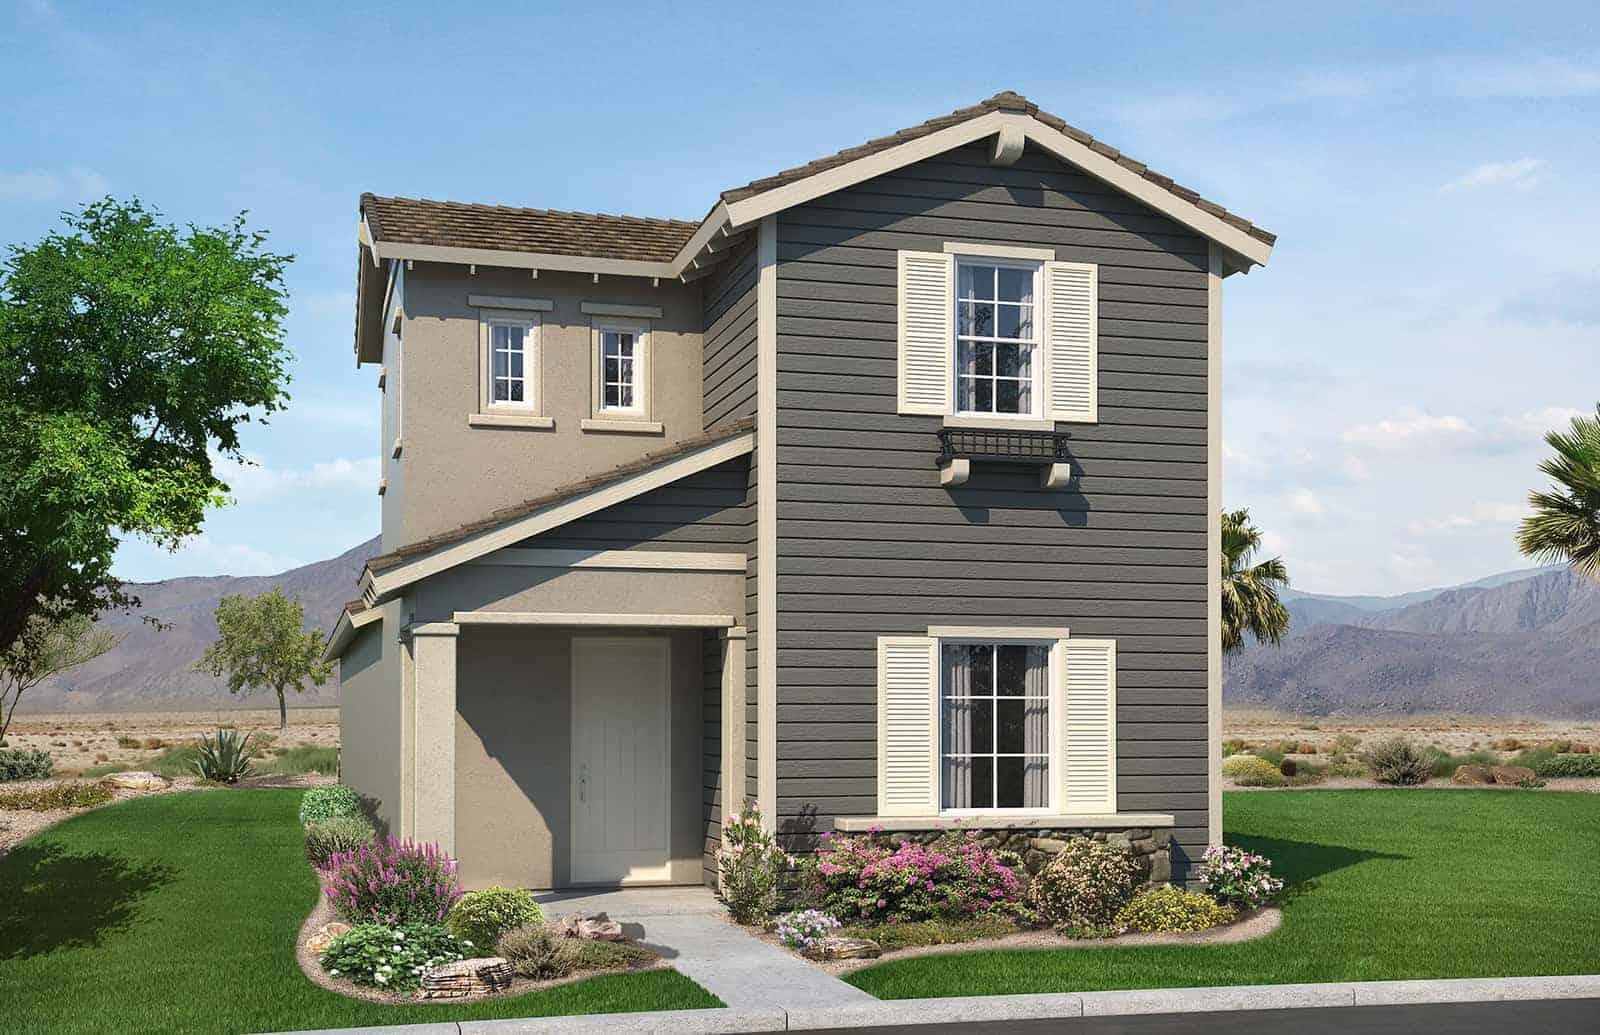 Cottages at Verrado   Residence 2   Plan B